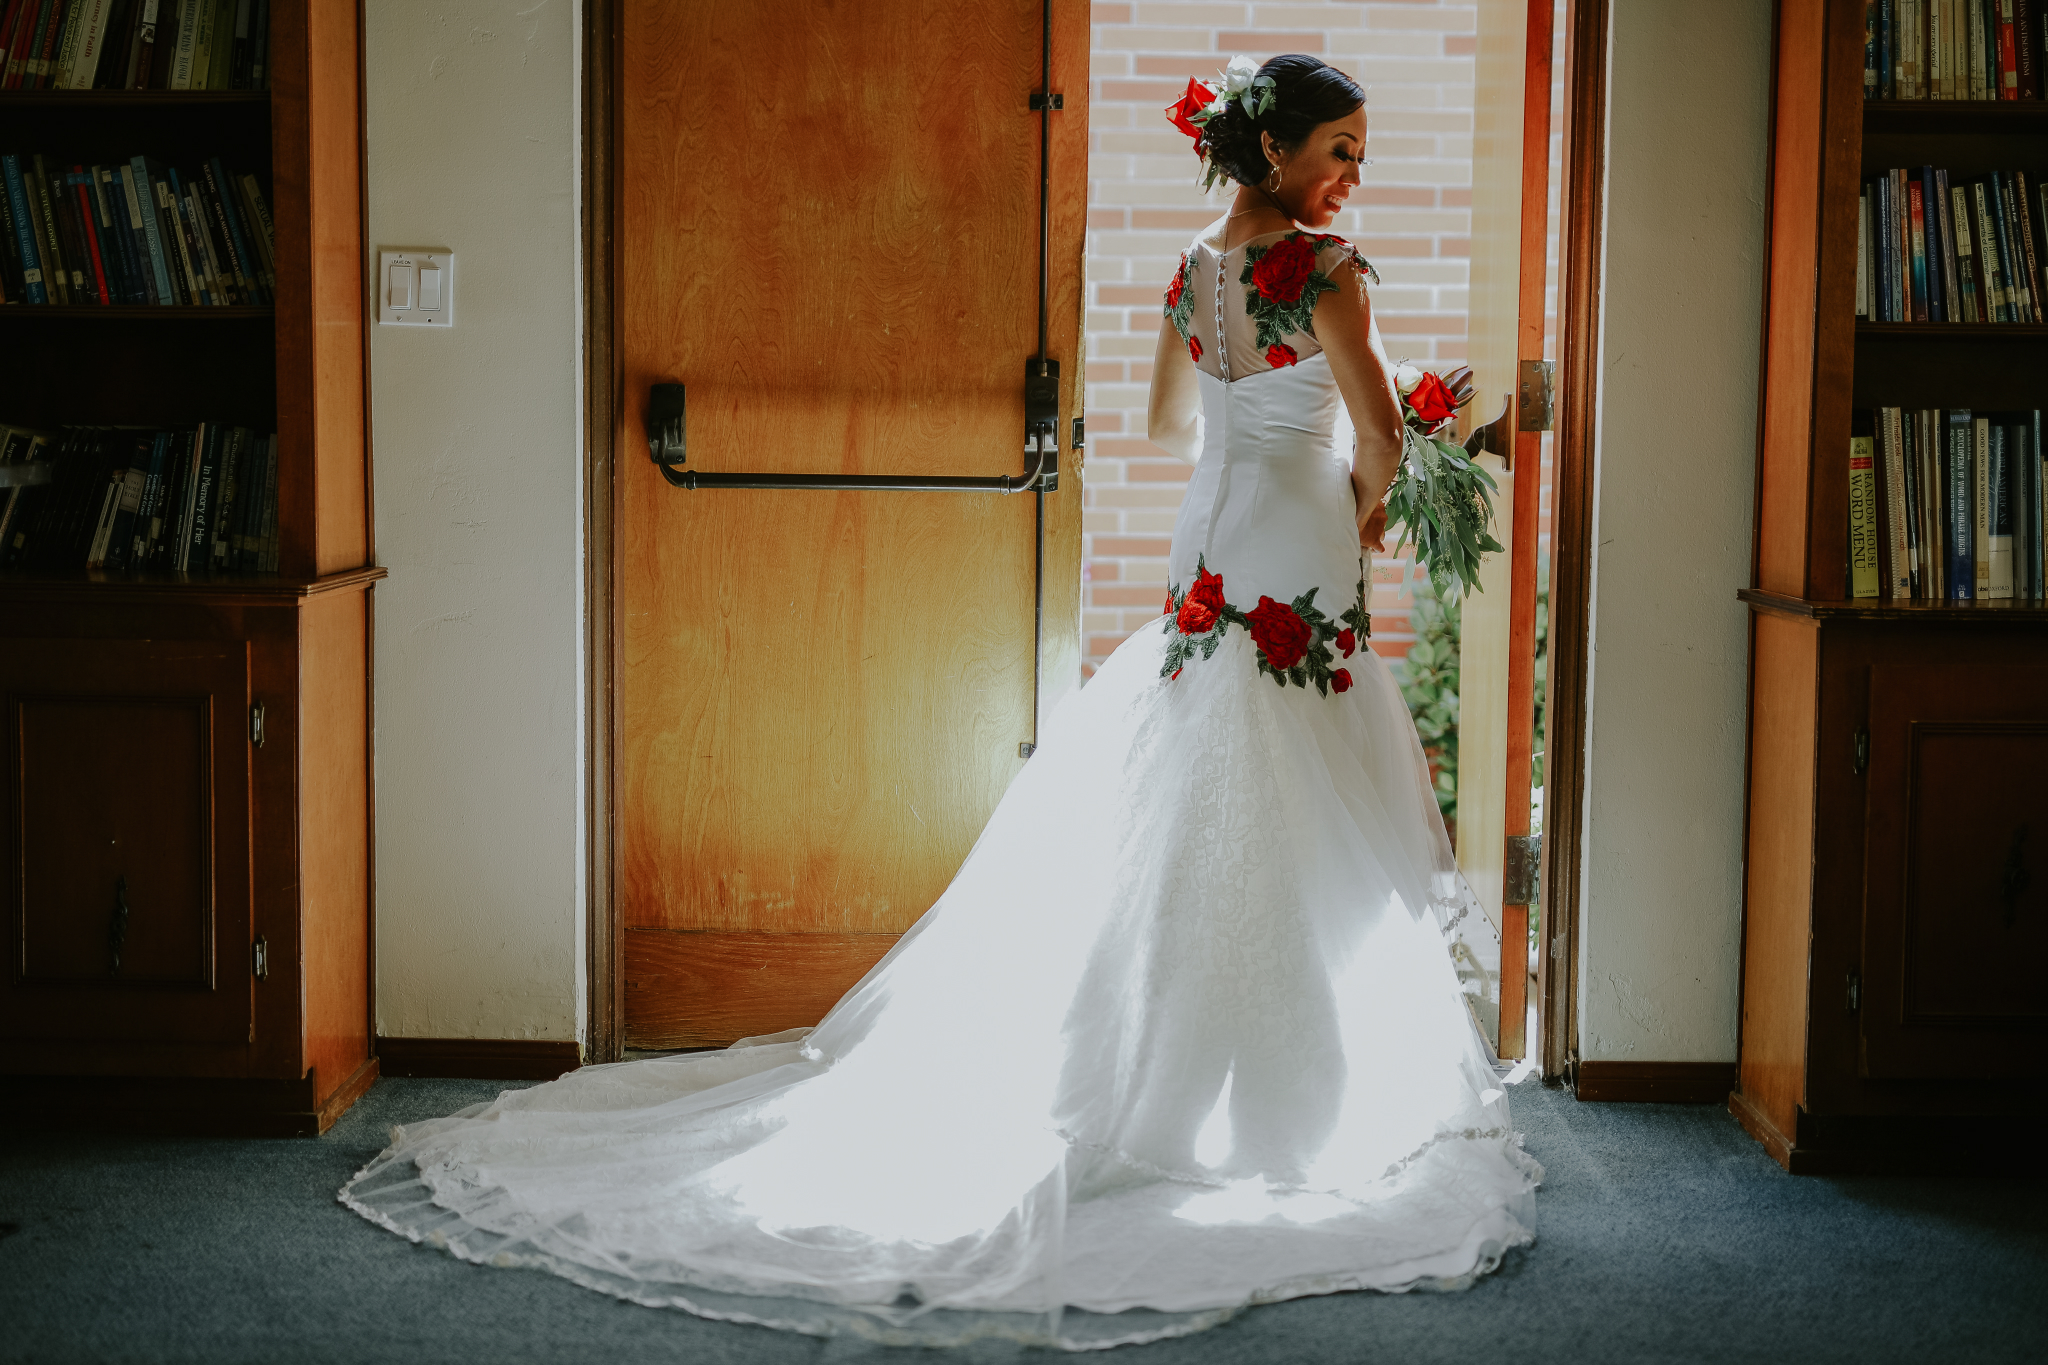 San Diego Wedding Photographer | bride posing next to the door